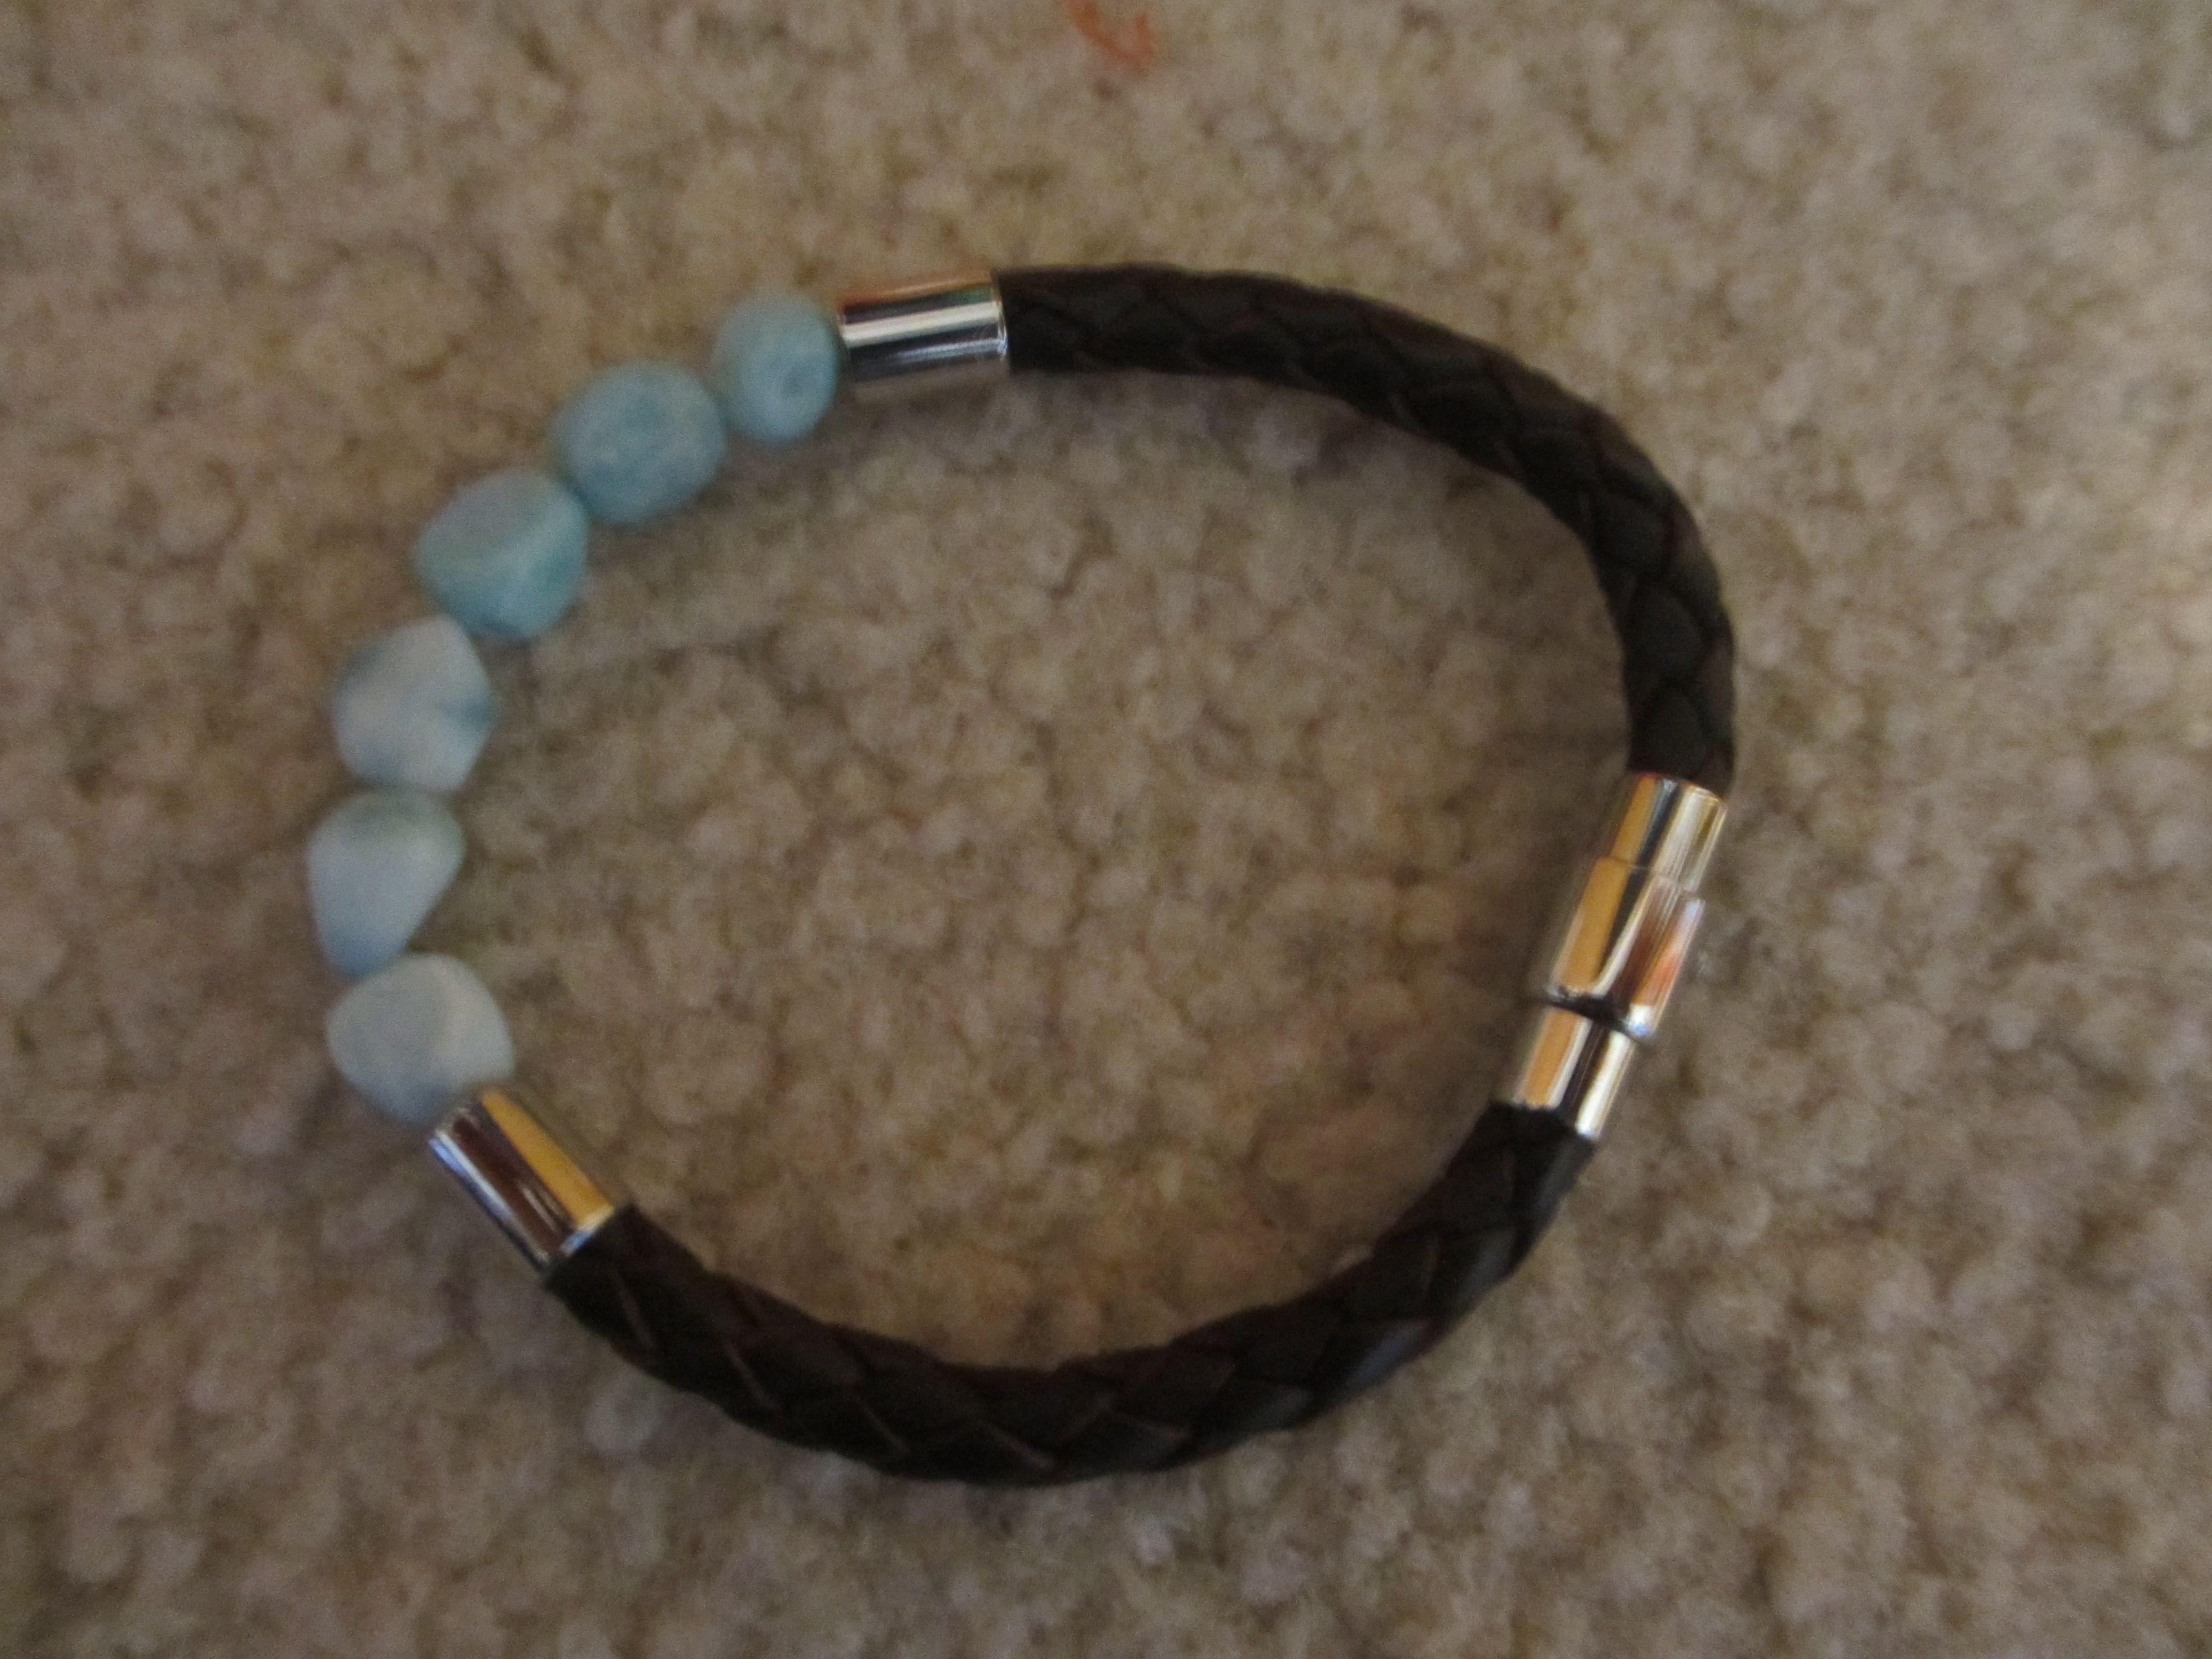 New Jewelmint Bracelet $2 pending